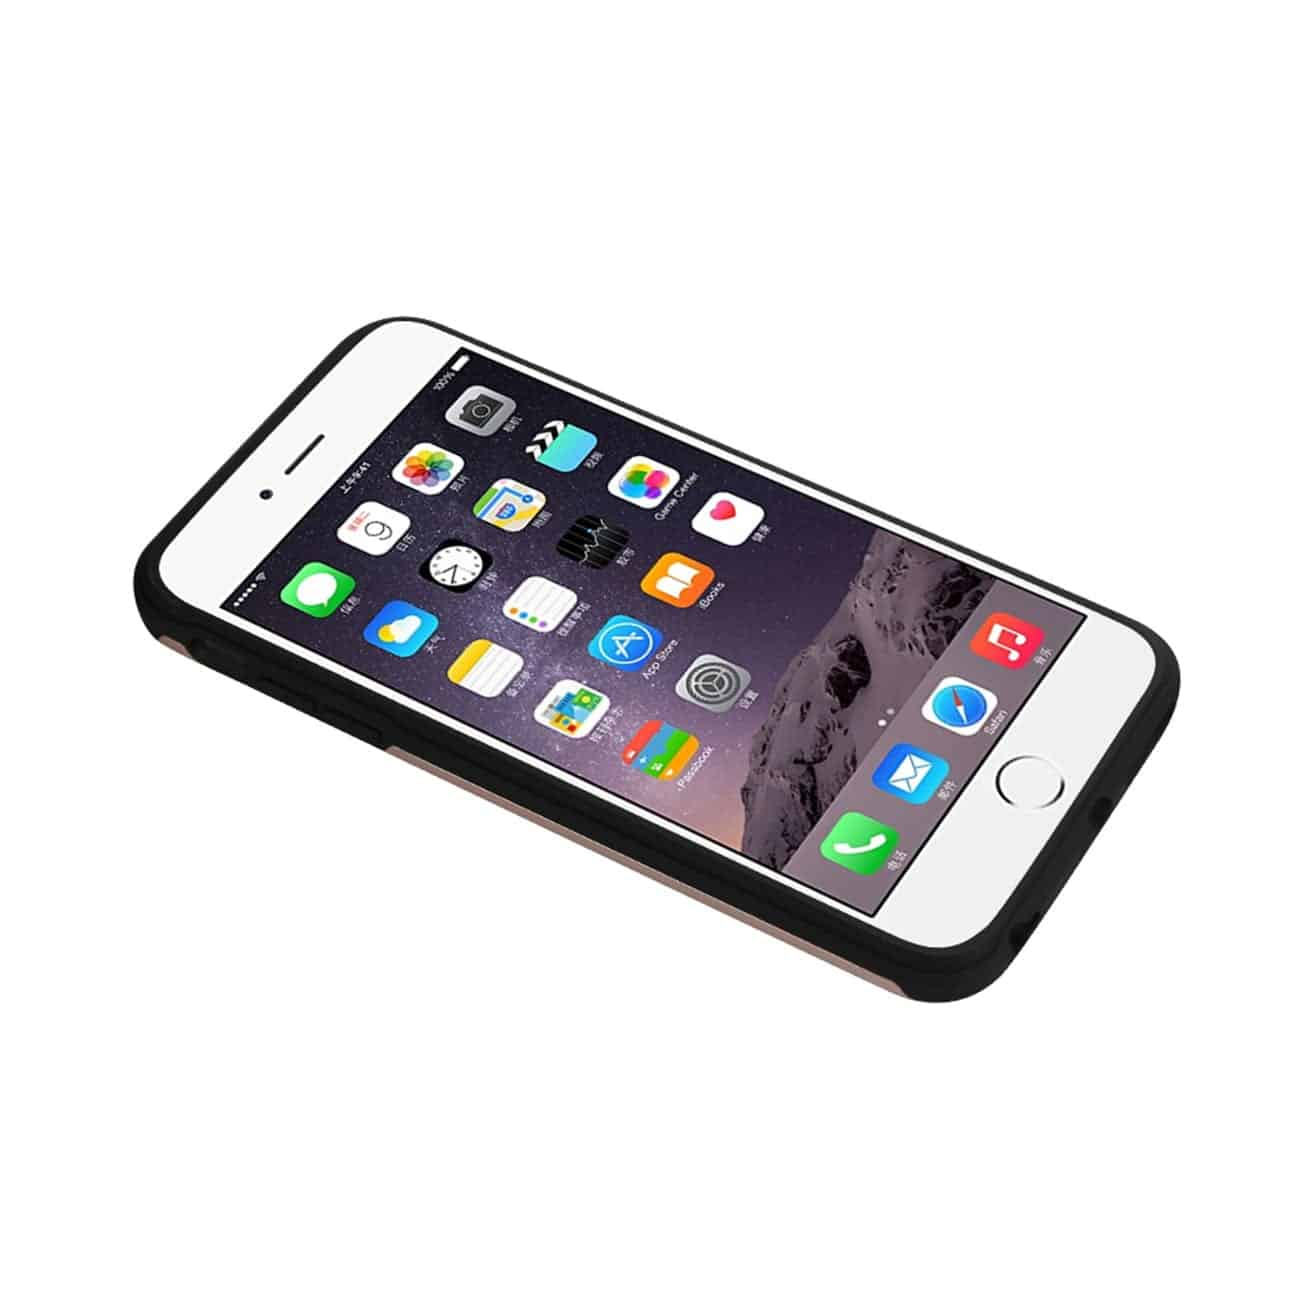 IPHONE 6S PLUS HYBRID SOLID ARMOR BUMPER CASE IN ROSE GOLD